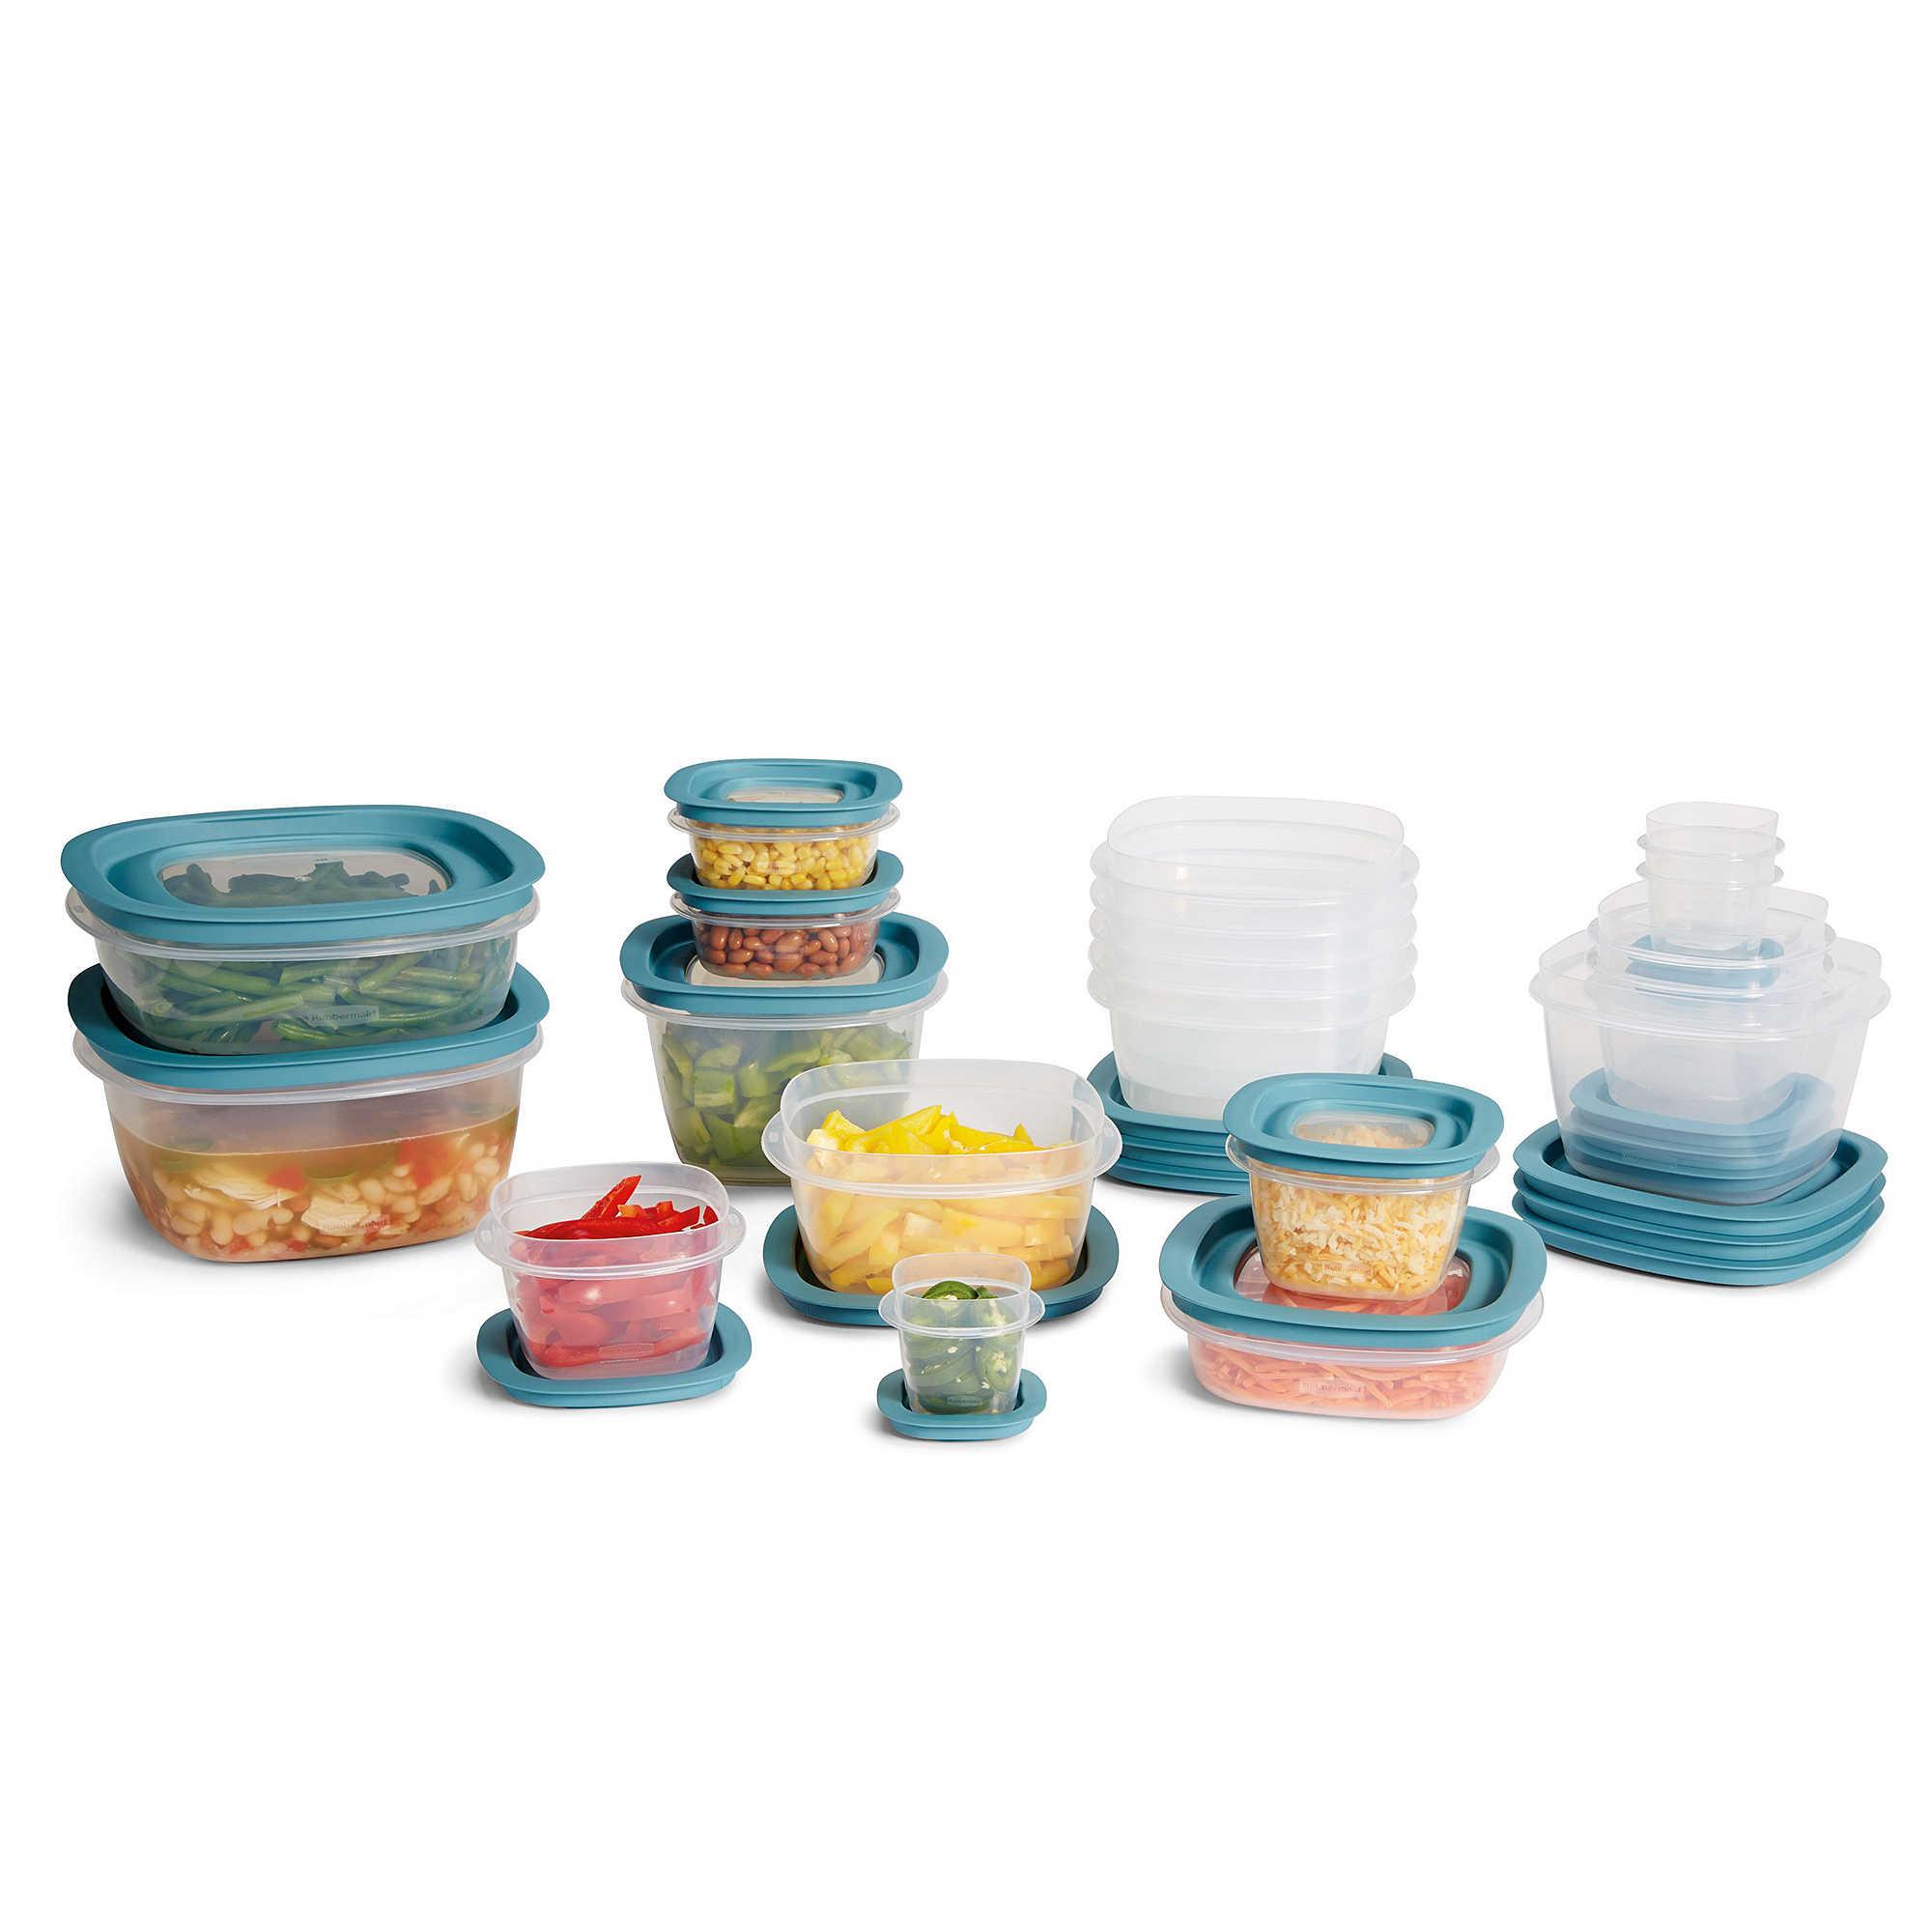 Rubbermaid food storage with Tritan plastic and Easy Fine Lids | eBay